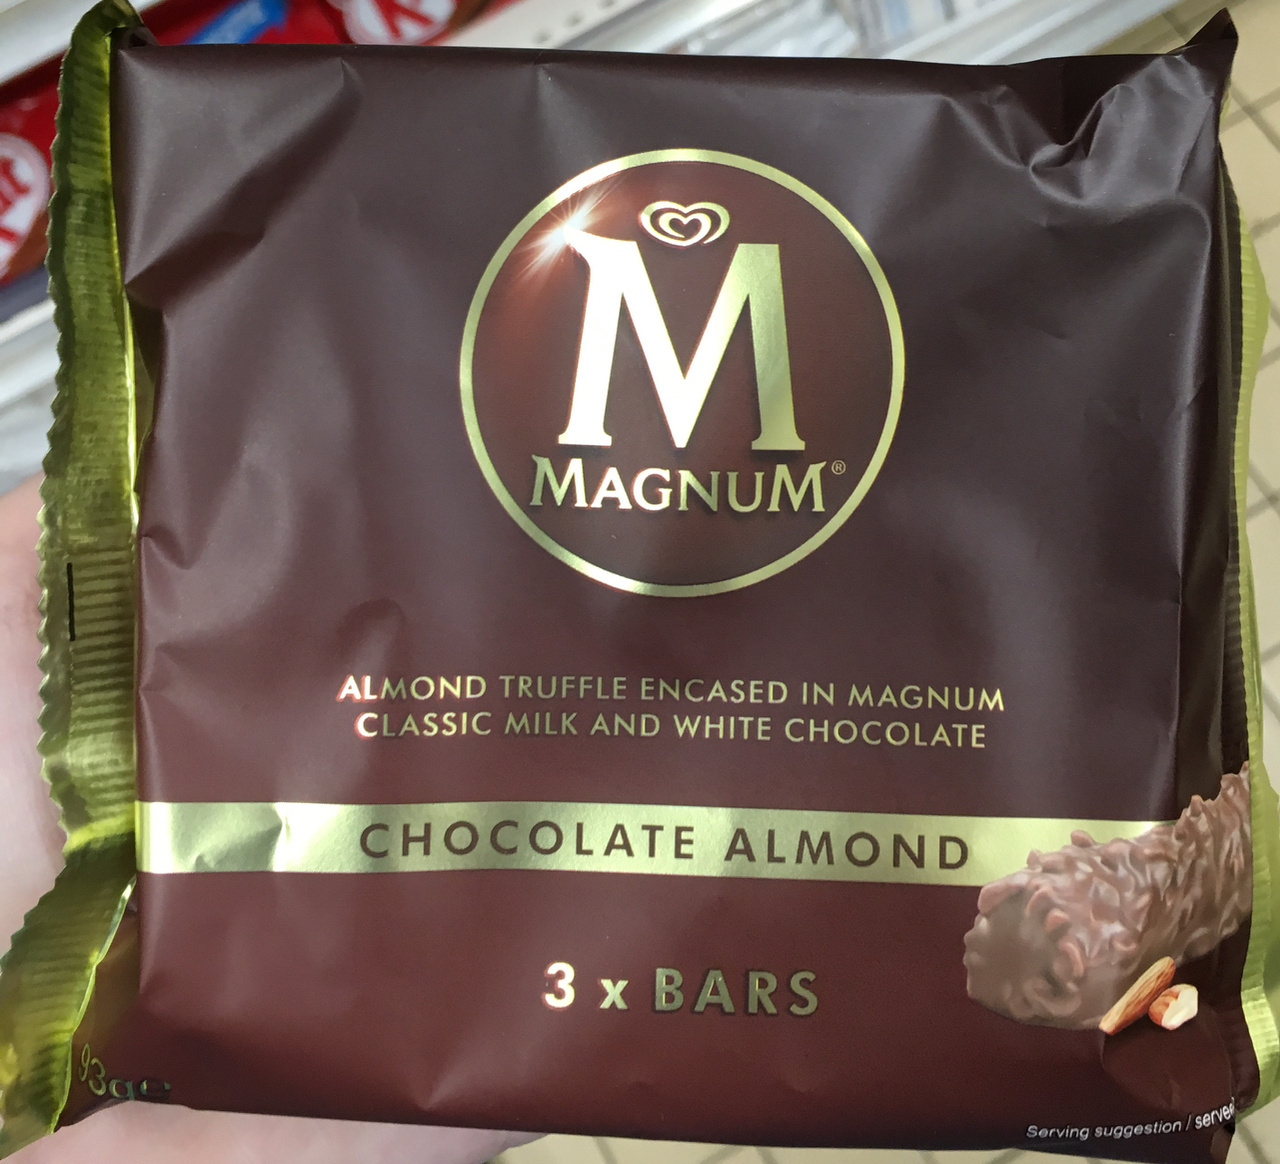 Chocolate Almond bars - Product